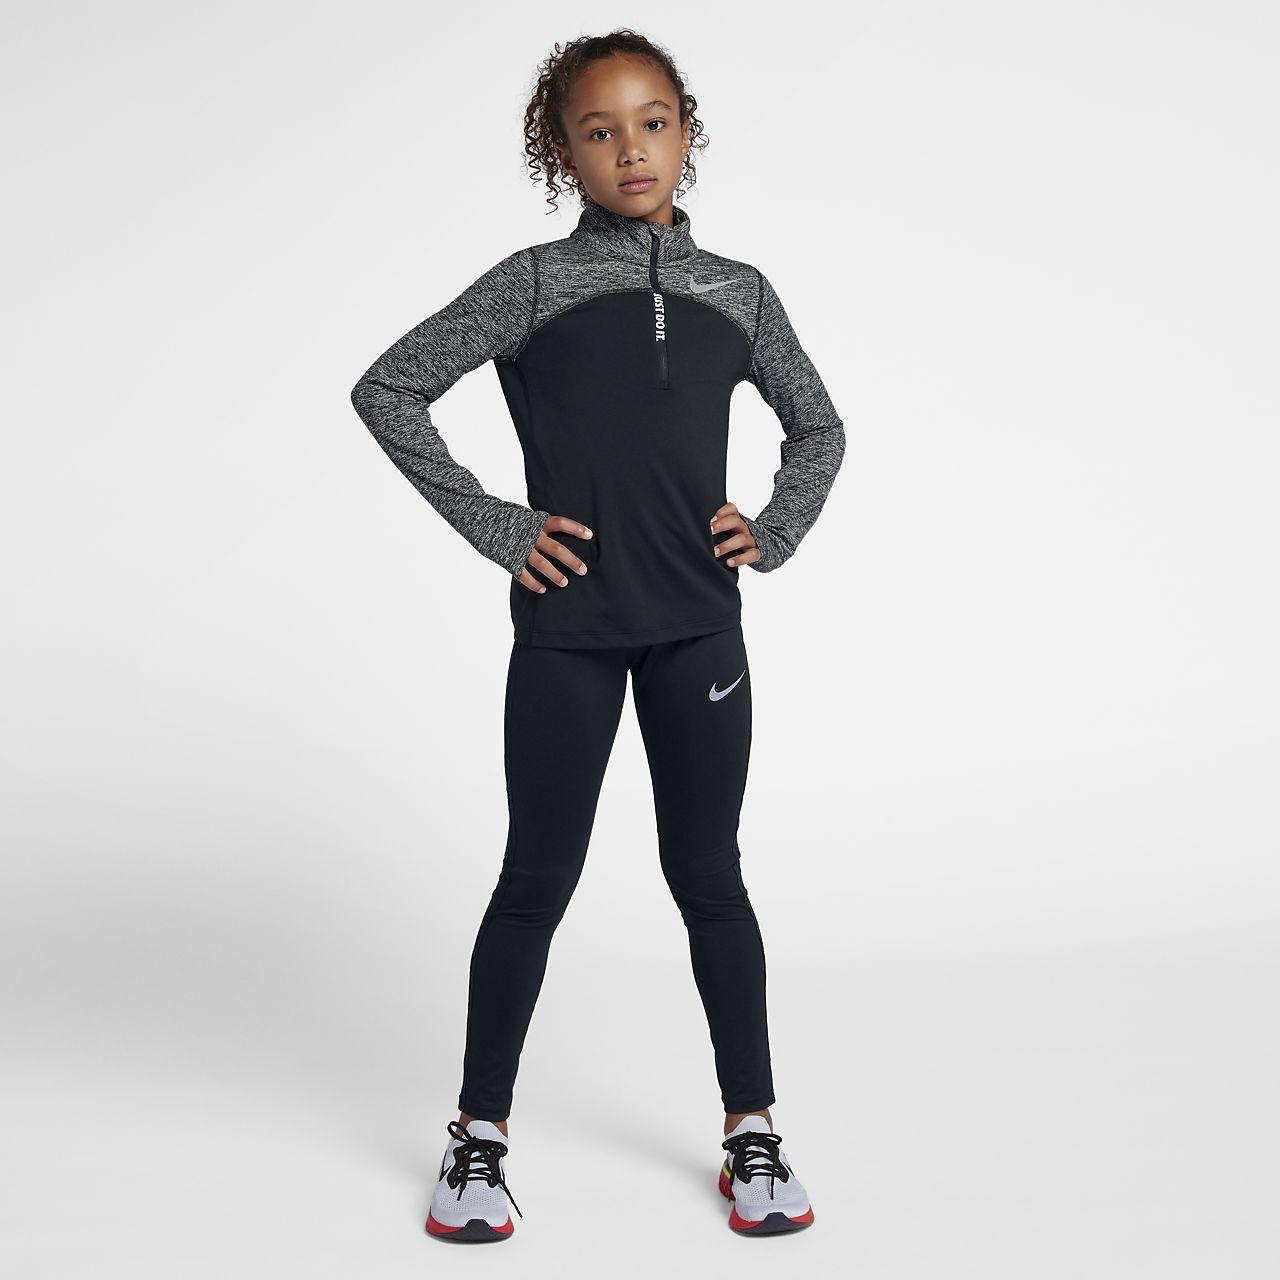 a6a675c1ebde44 Nike Power Older Kids' (Girls') 3/4 Running Tights. Nike.com ZA